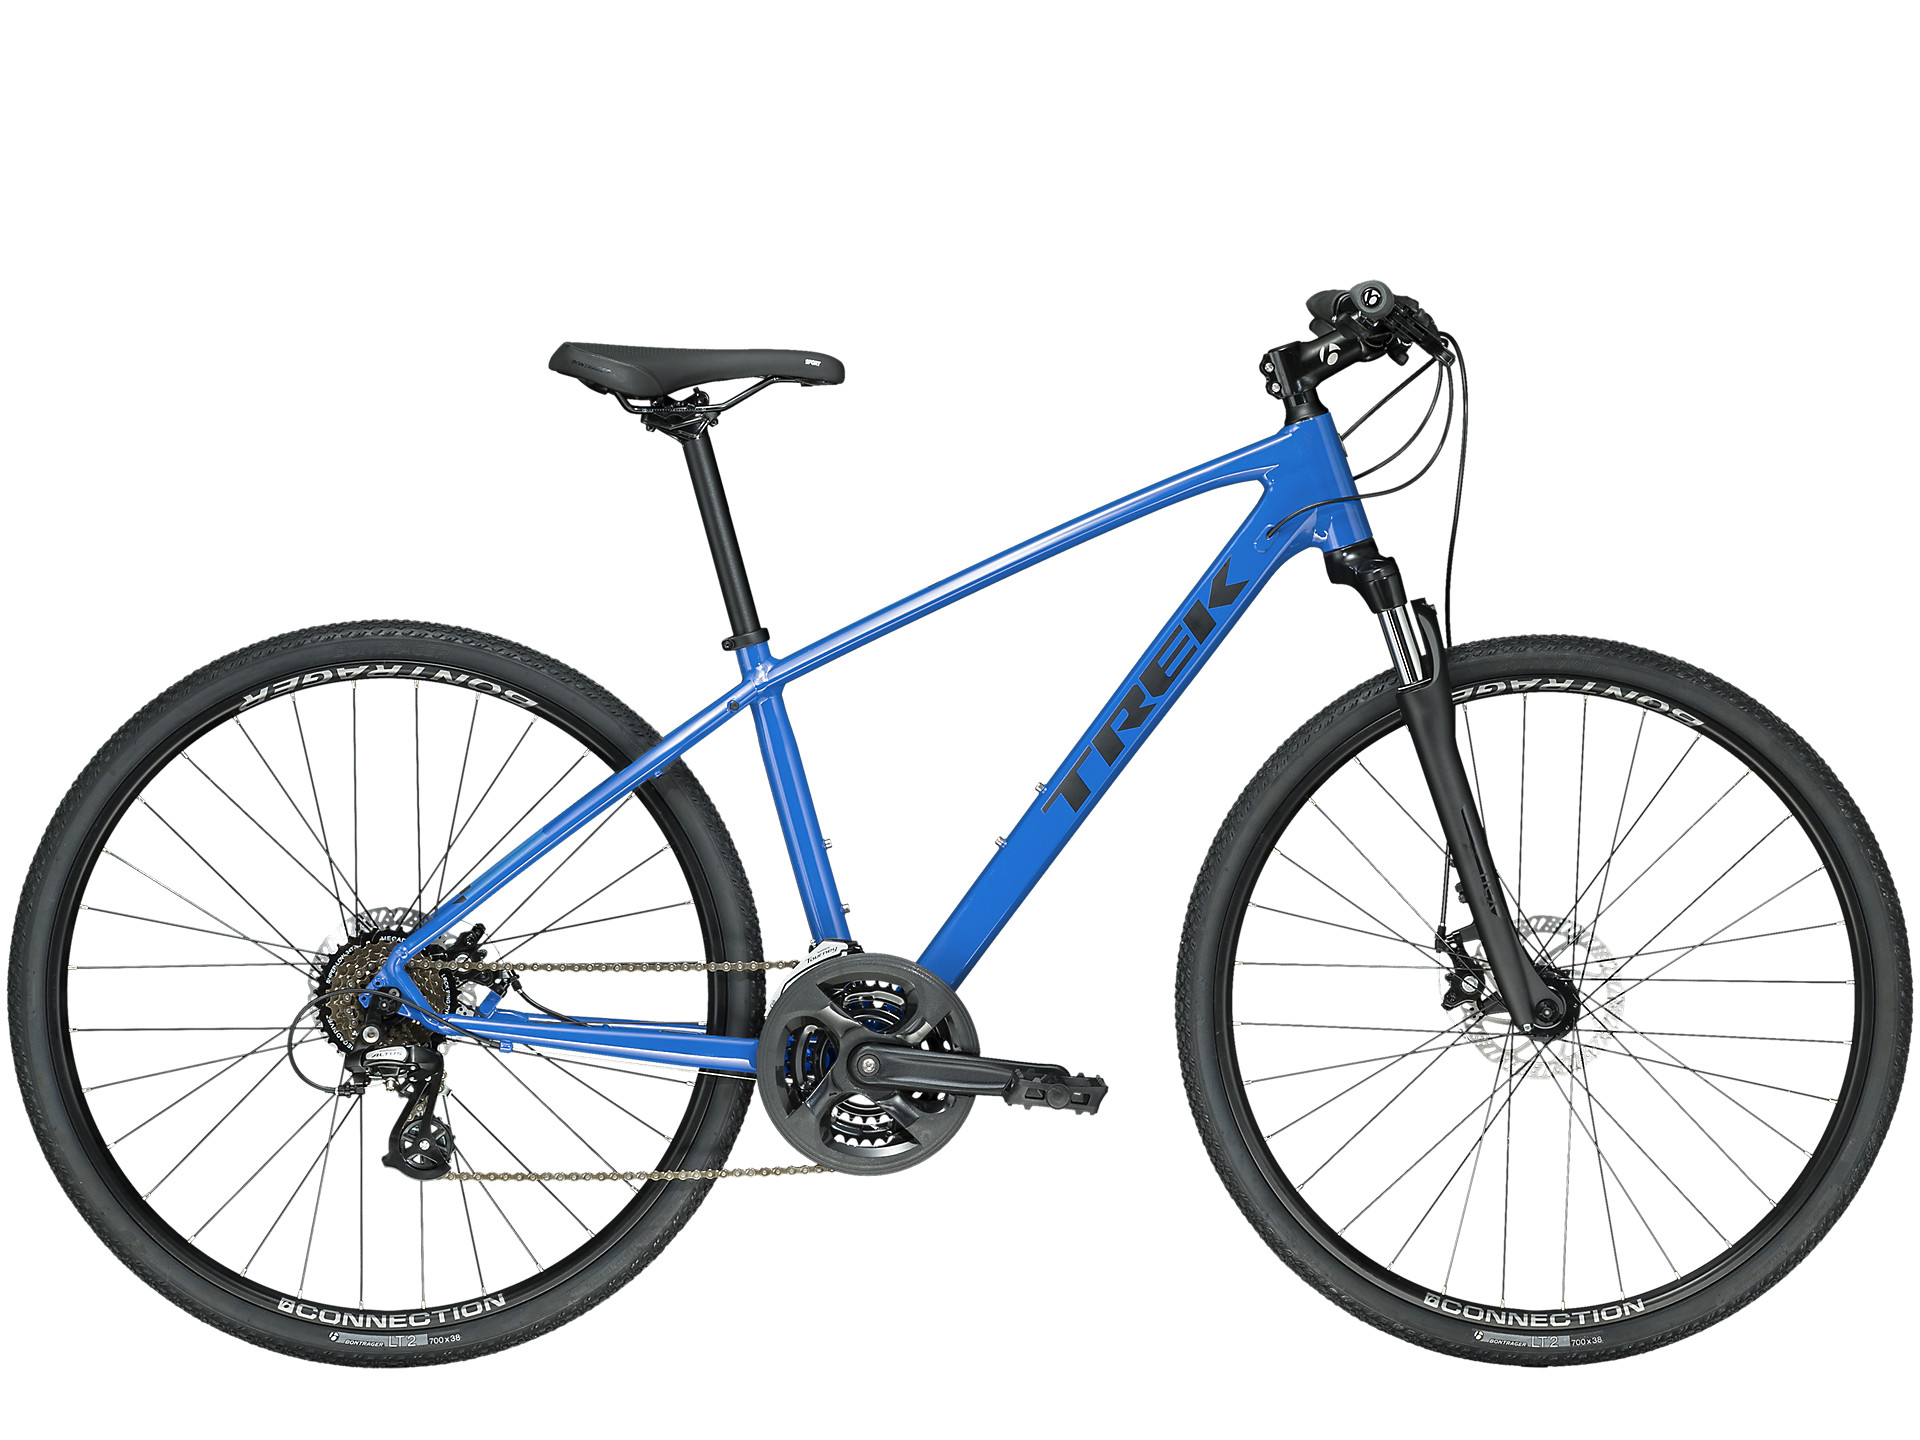 79b6b88c2 Dual Sport bikes | Trek Bikes